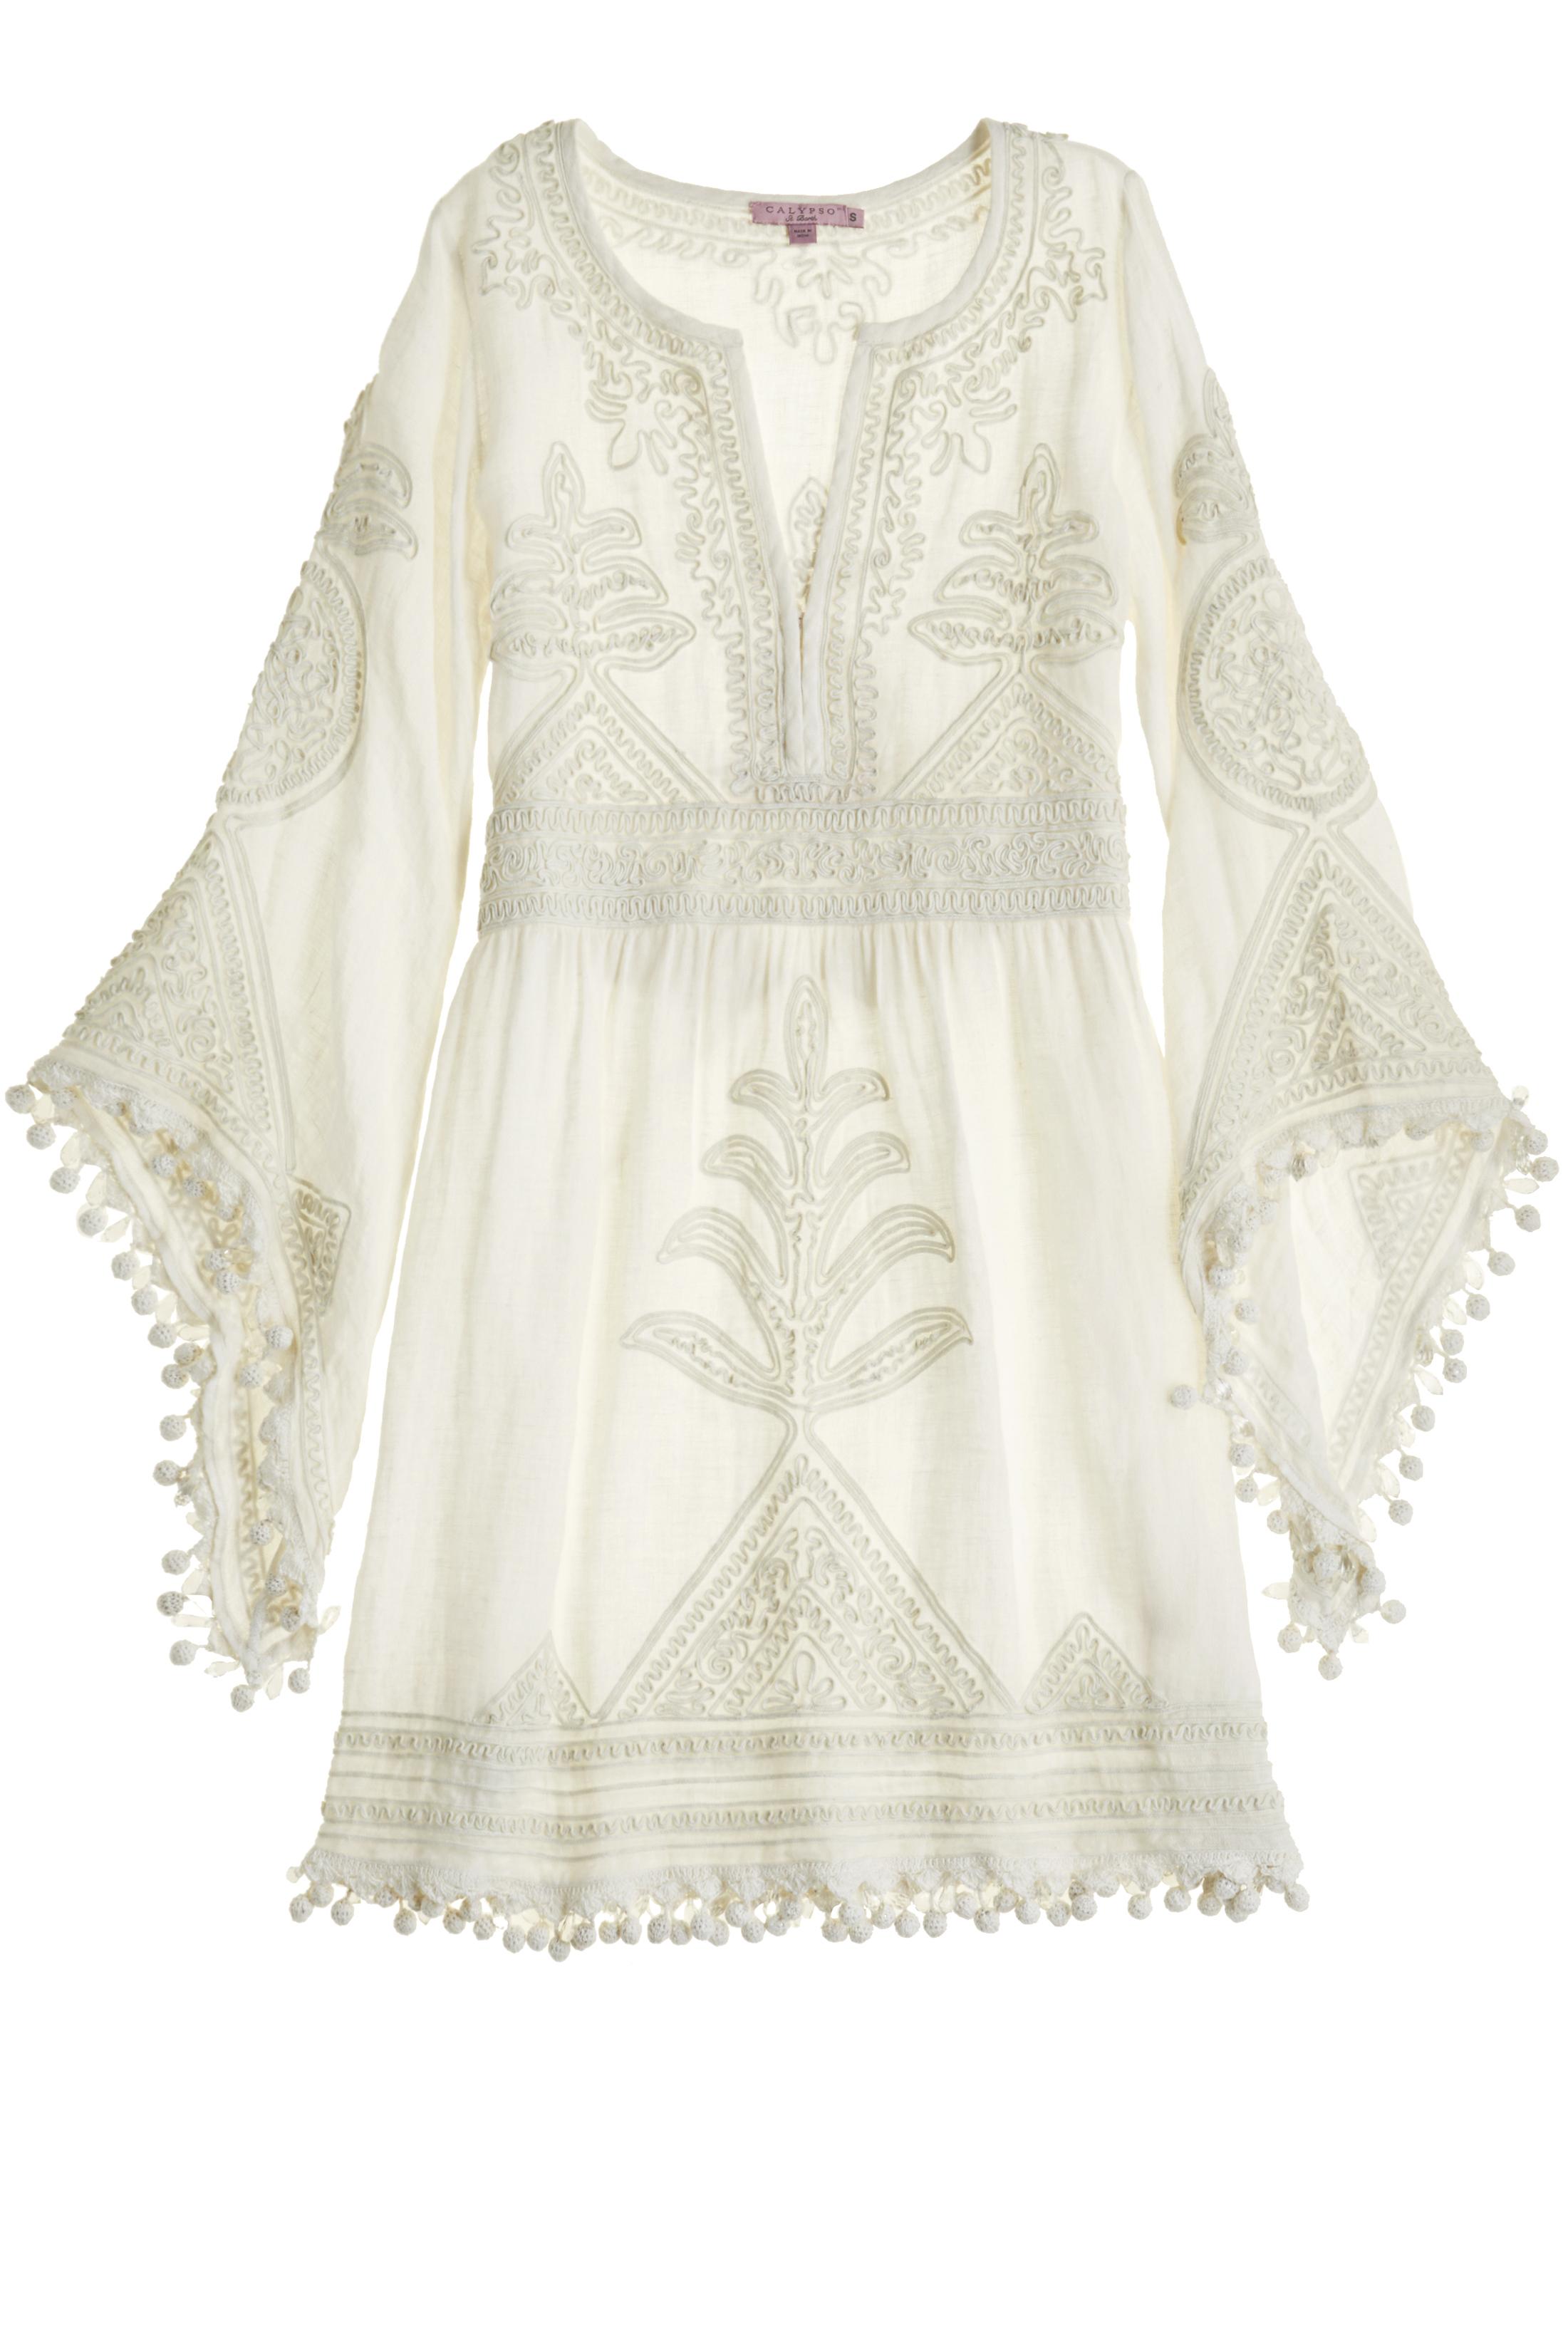 calypso-st-barth-bridal-playla-dress-0315.jpg